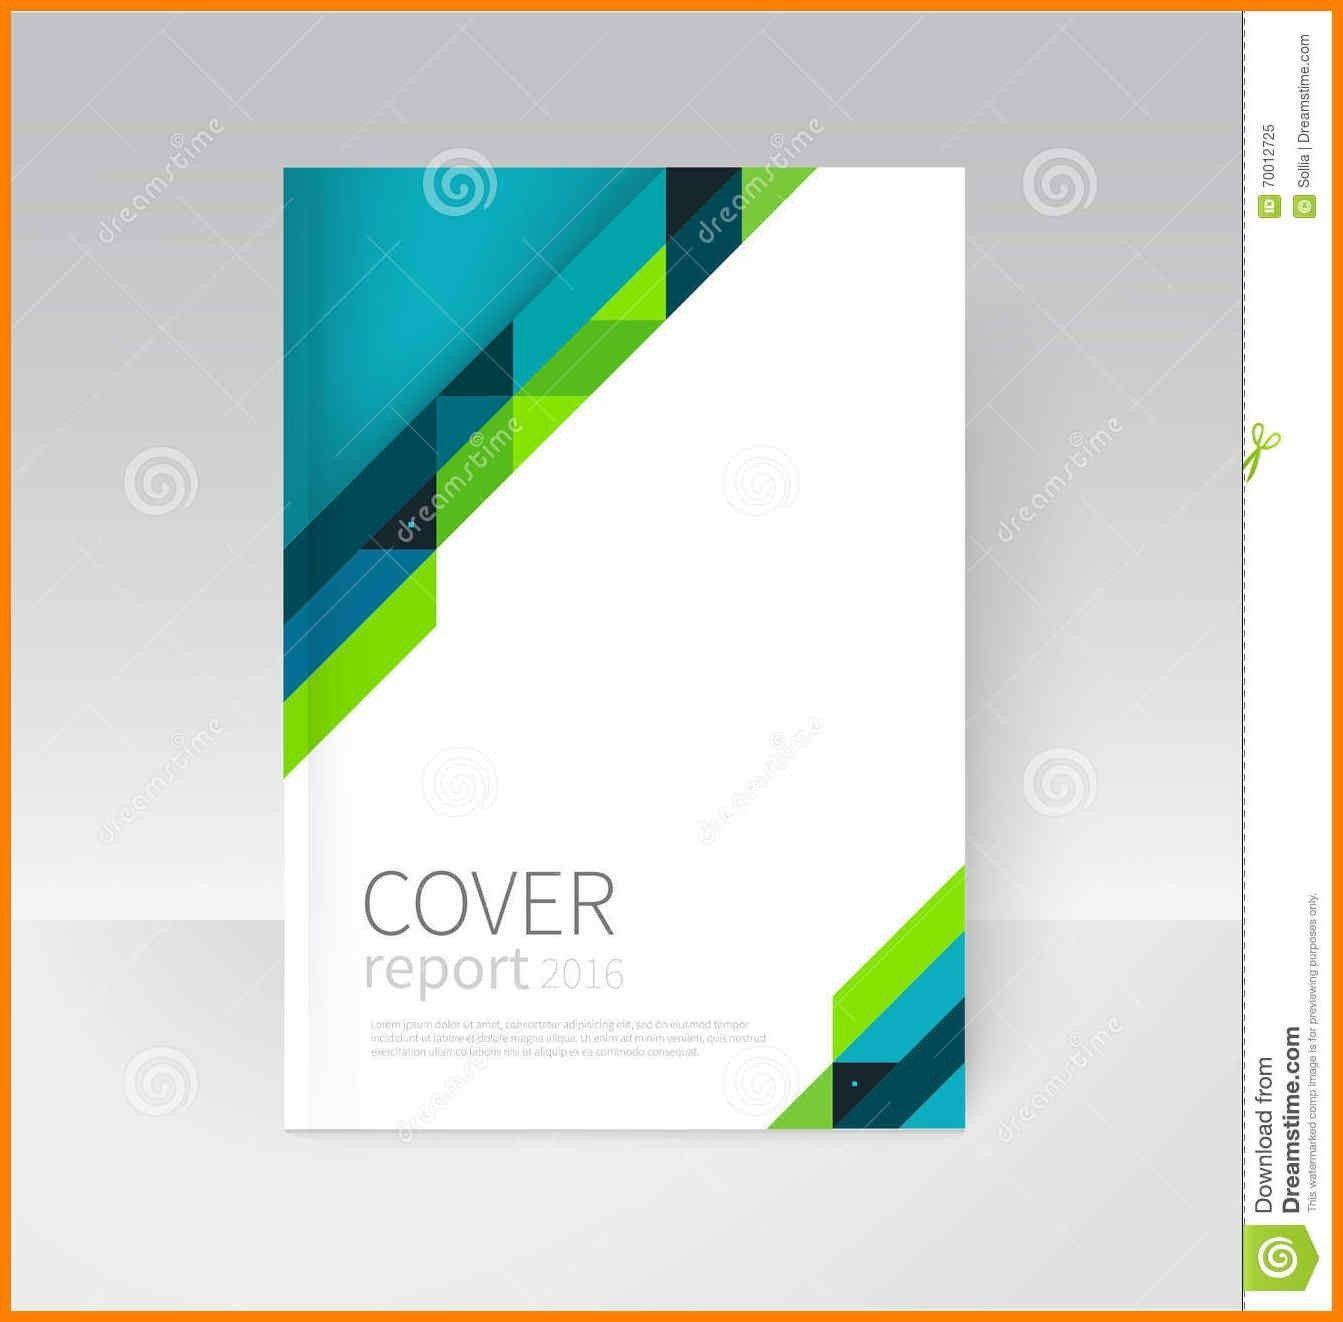 002 Wondrou Book Cover Template Free Download Sample  Illustrator Design Vector IllustrationFull